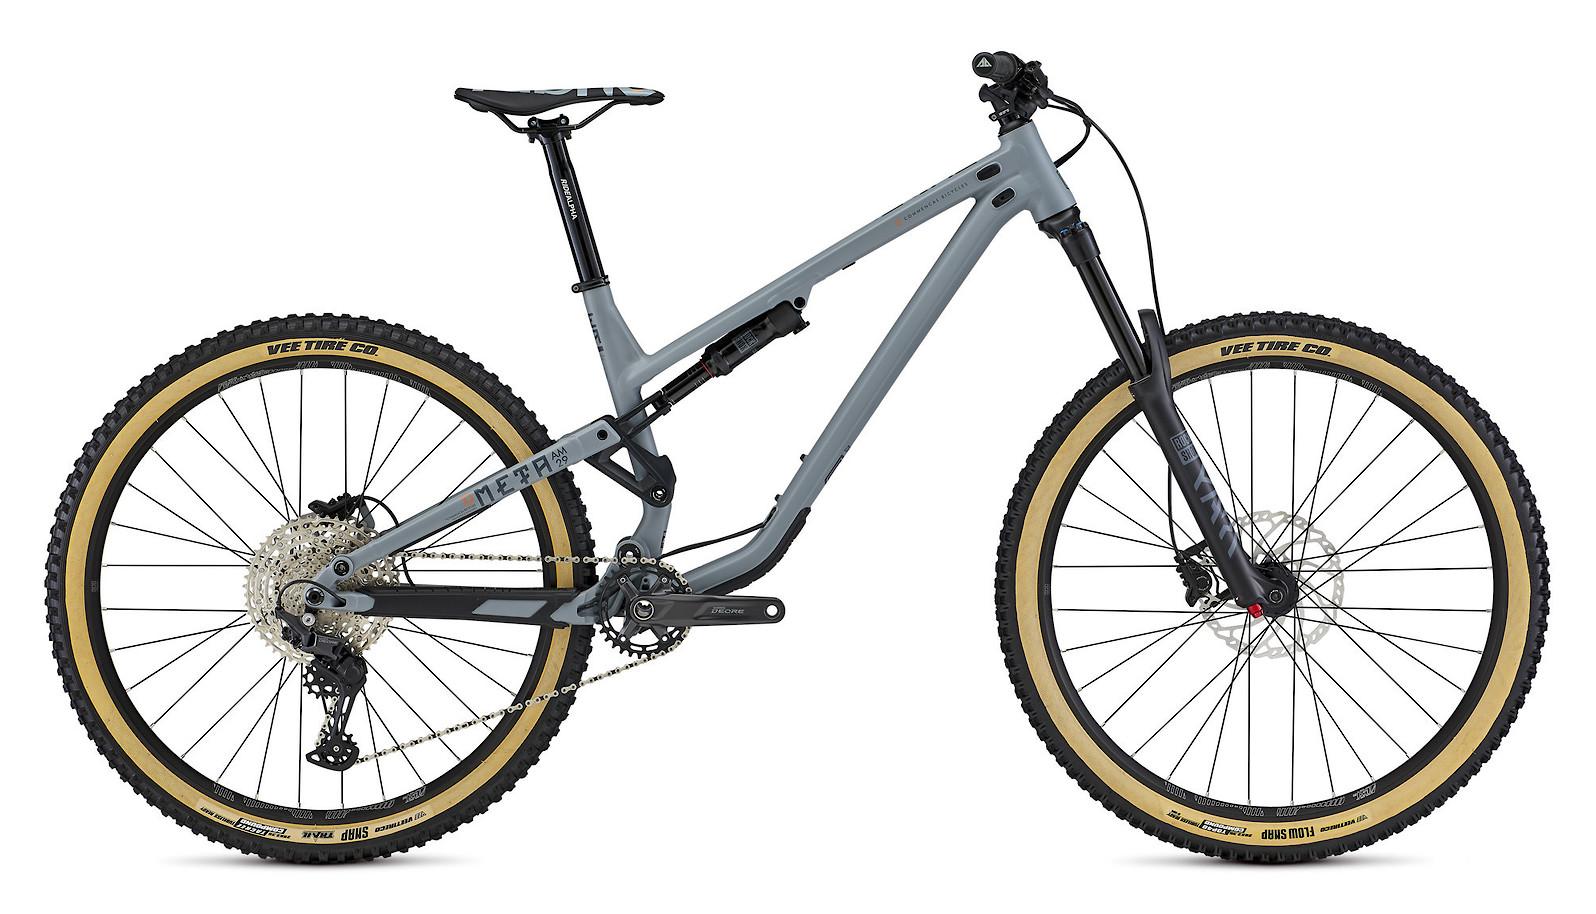 2021 Commencal Meta AM 29 Origin (Graphite Blue + tanwall tires)